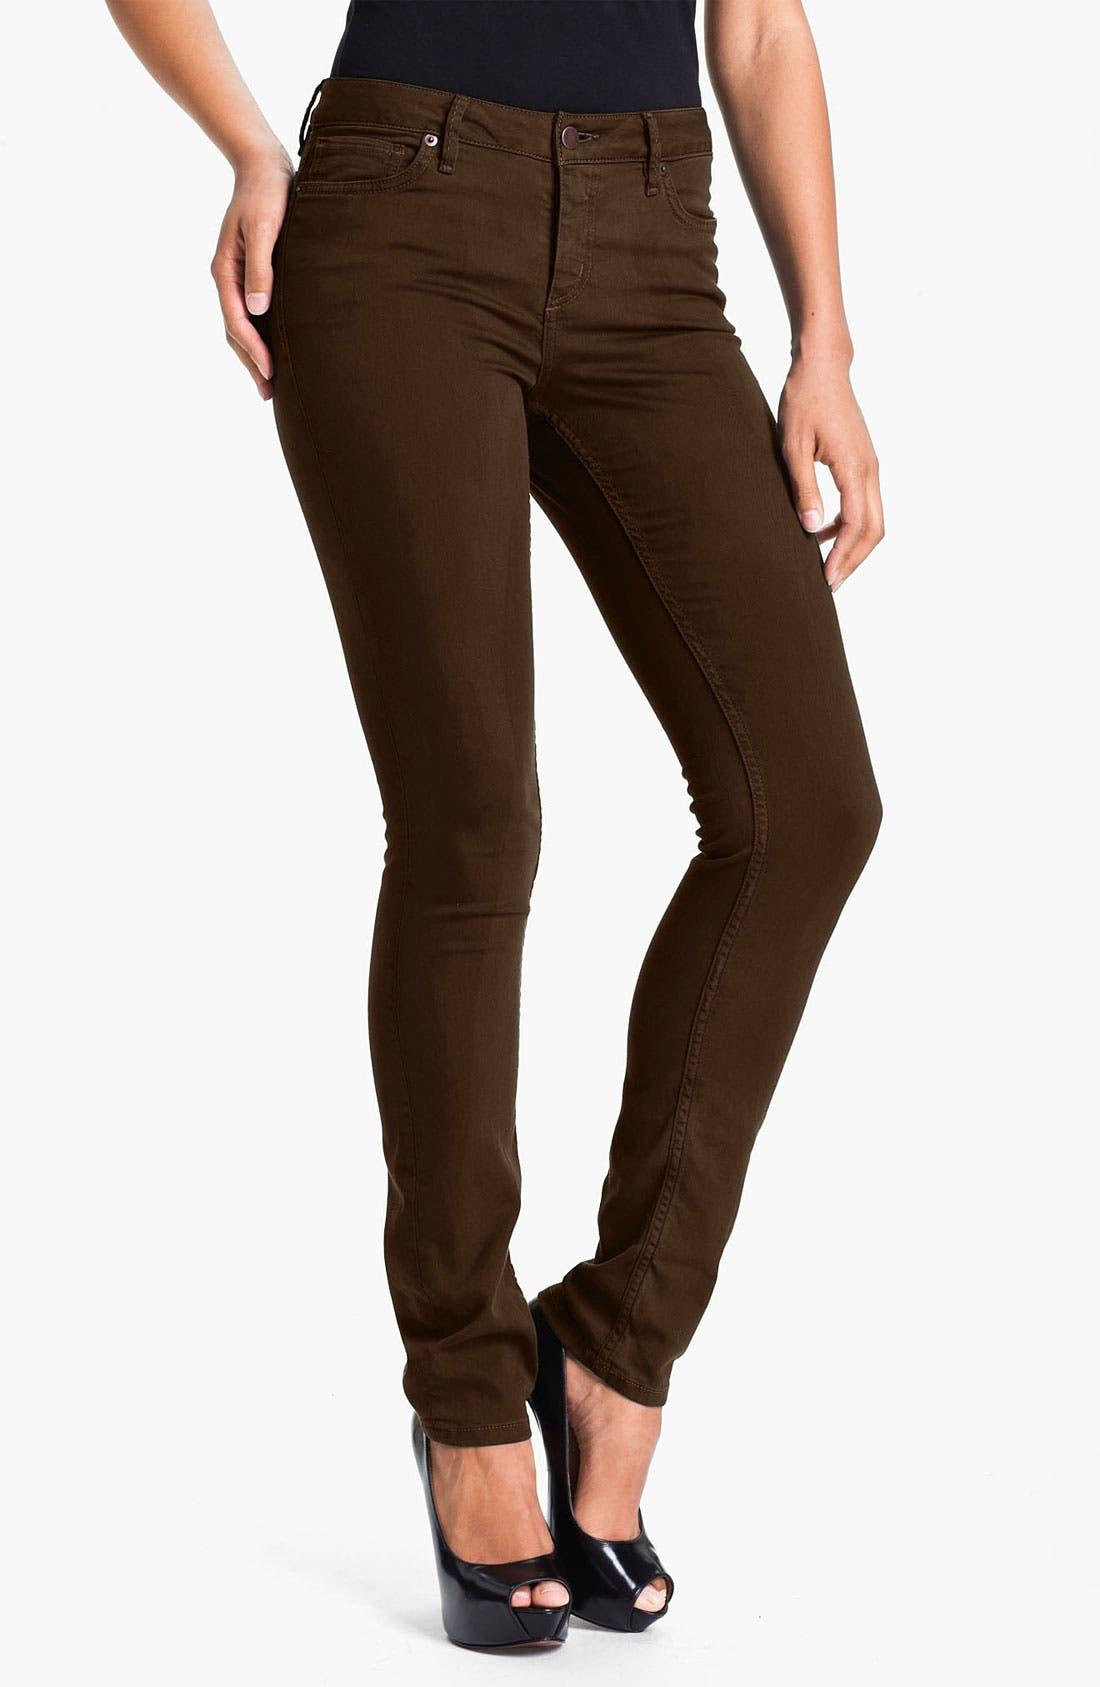 Main Image - Christopher Blue 'Sophia' Twill Skinny Jeans